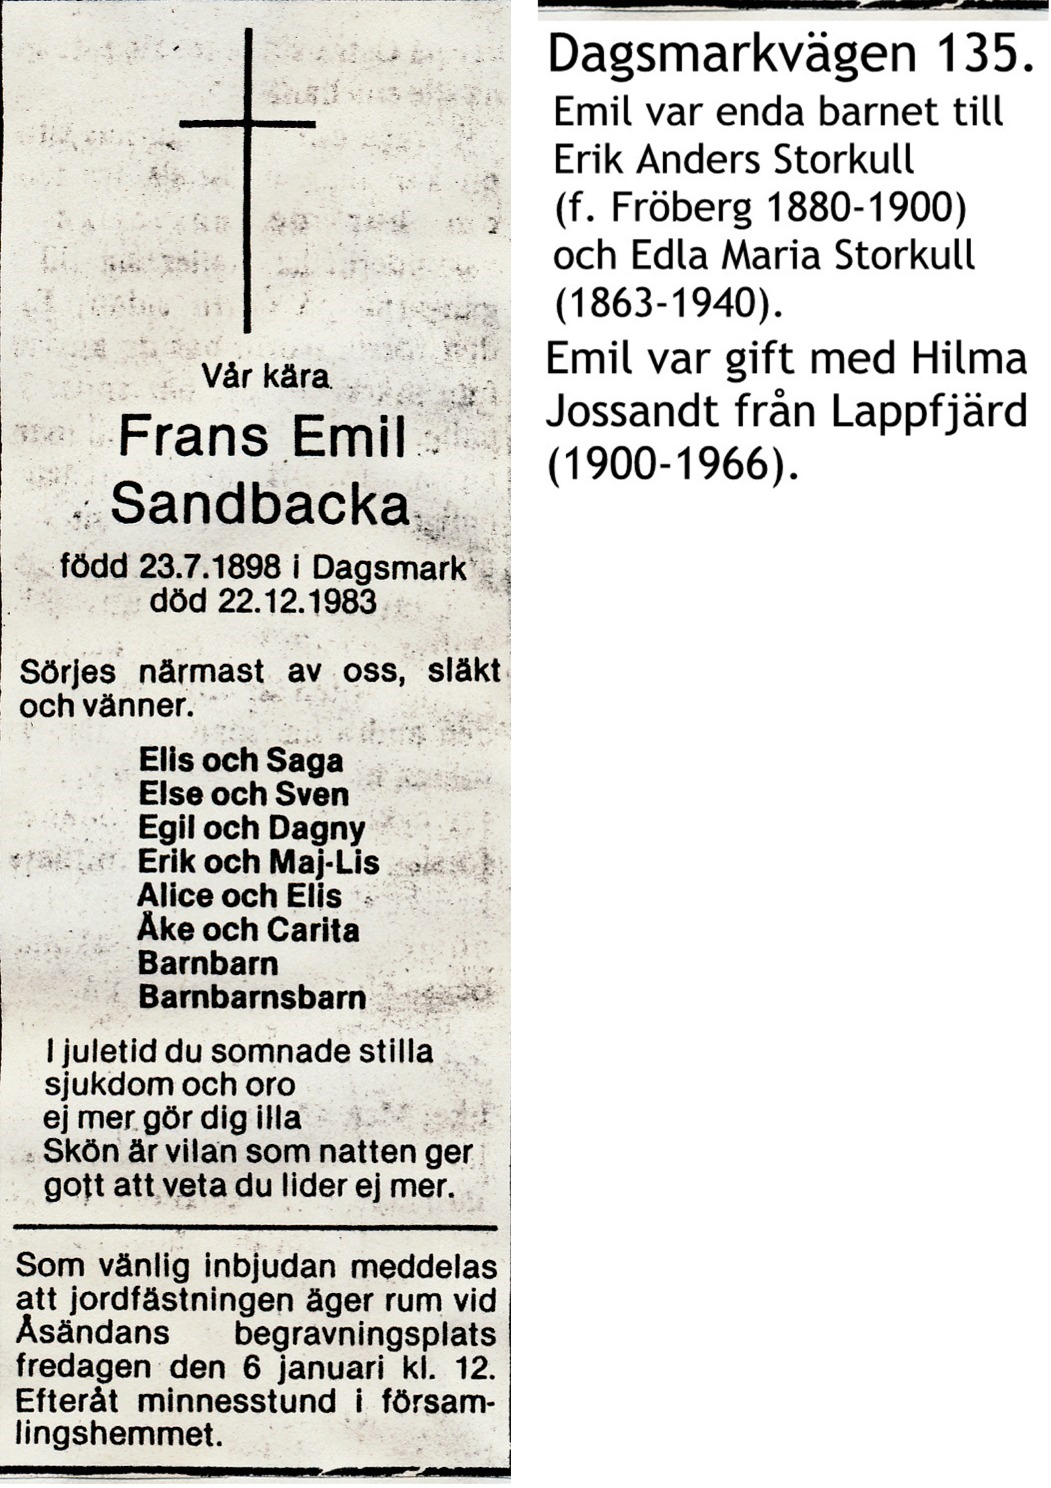 Sandbacka Emil